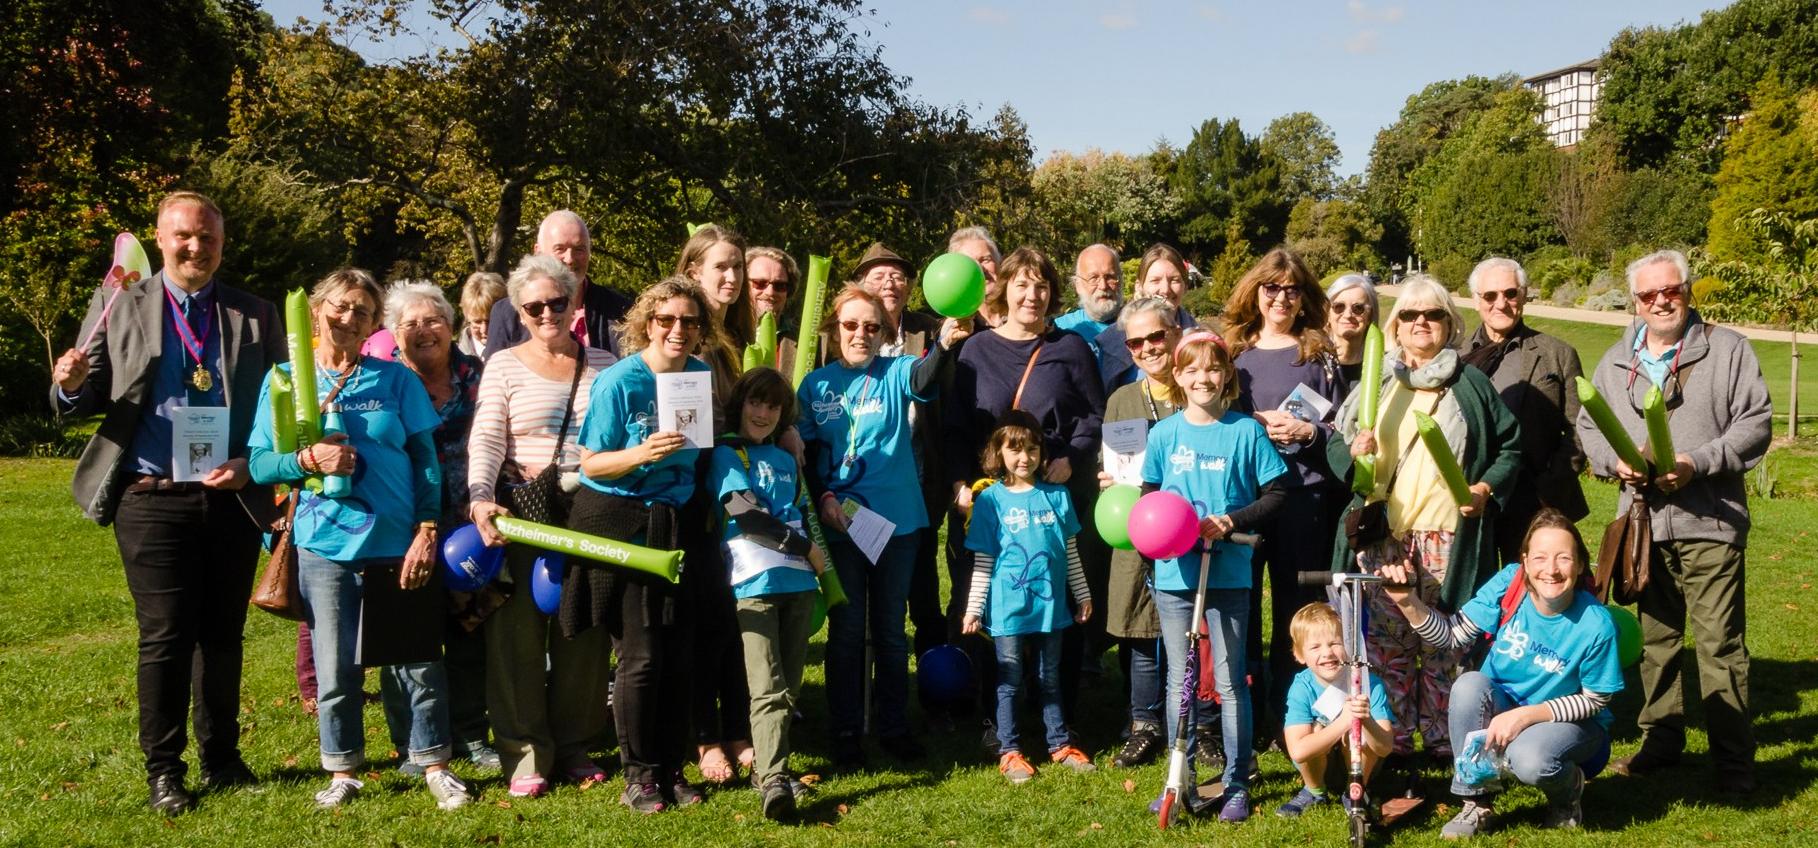 Jay's Alexandra Park memory walk is a huge success